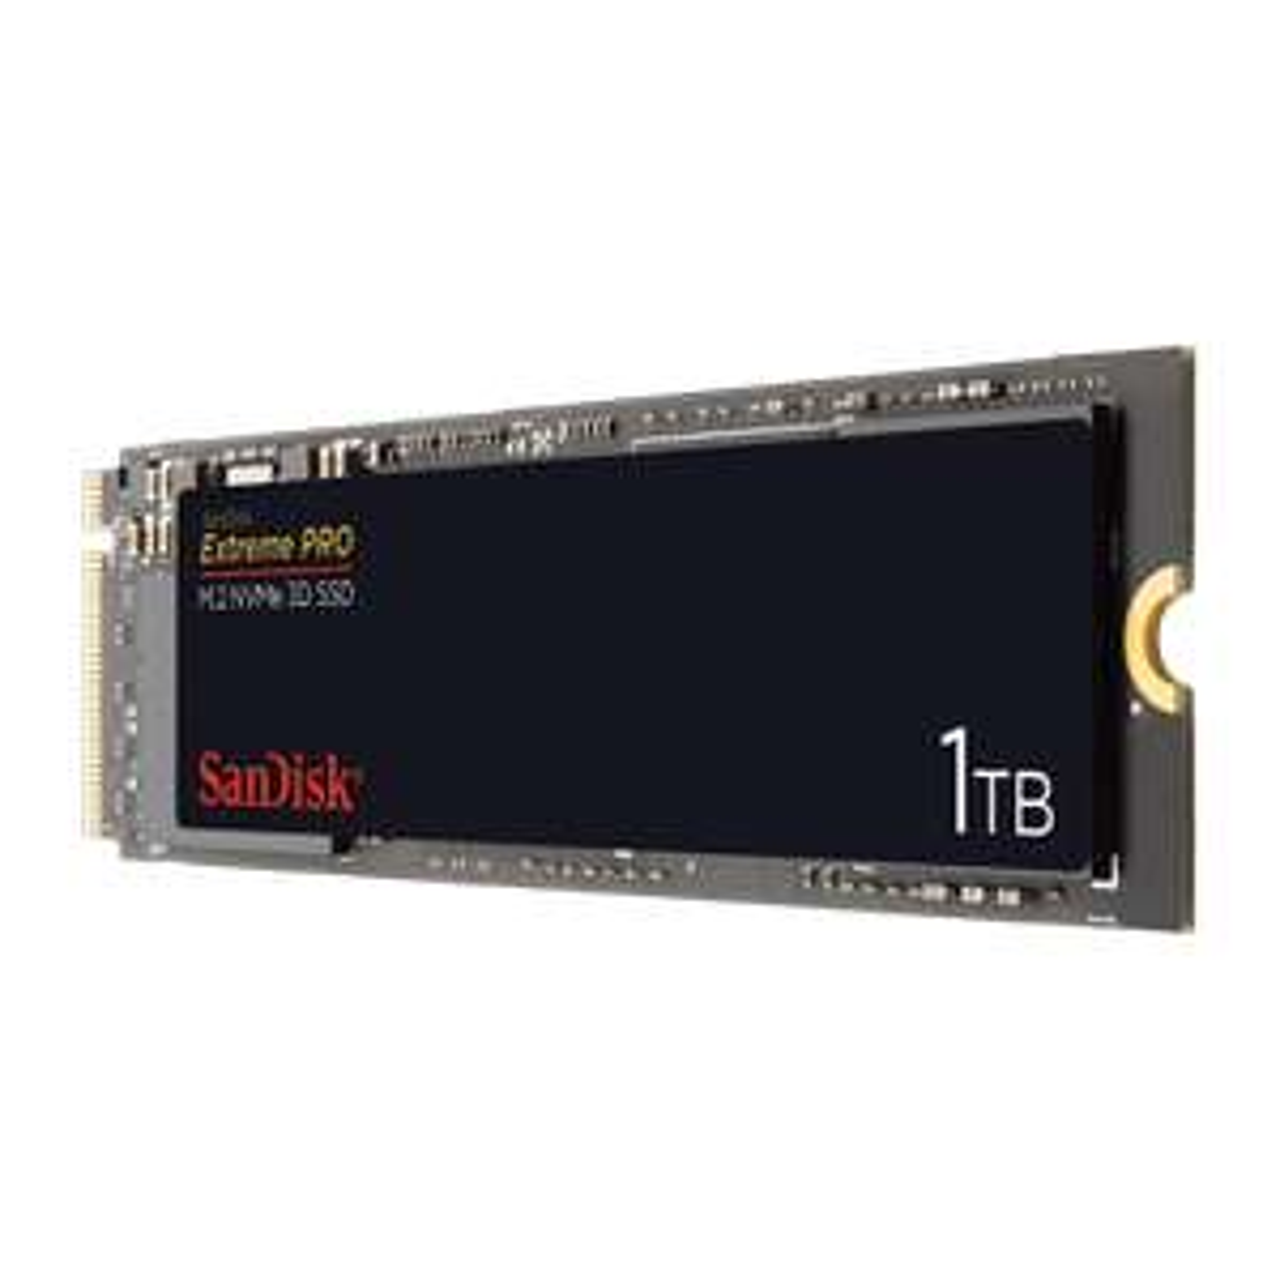 SanDisk Extreme Pro 1TB M.2